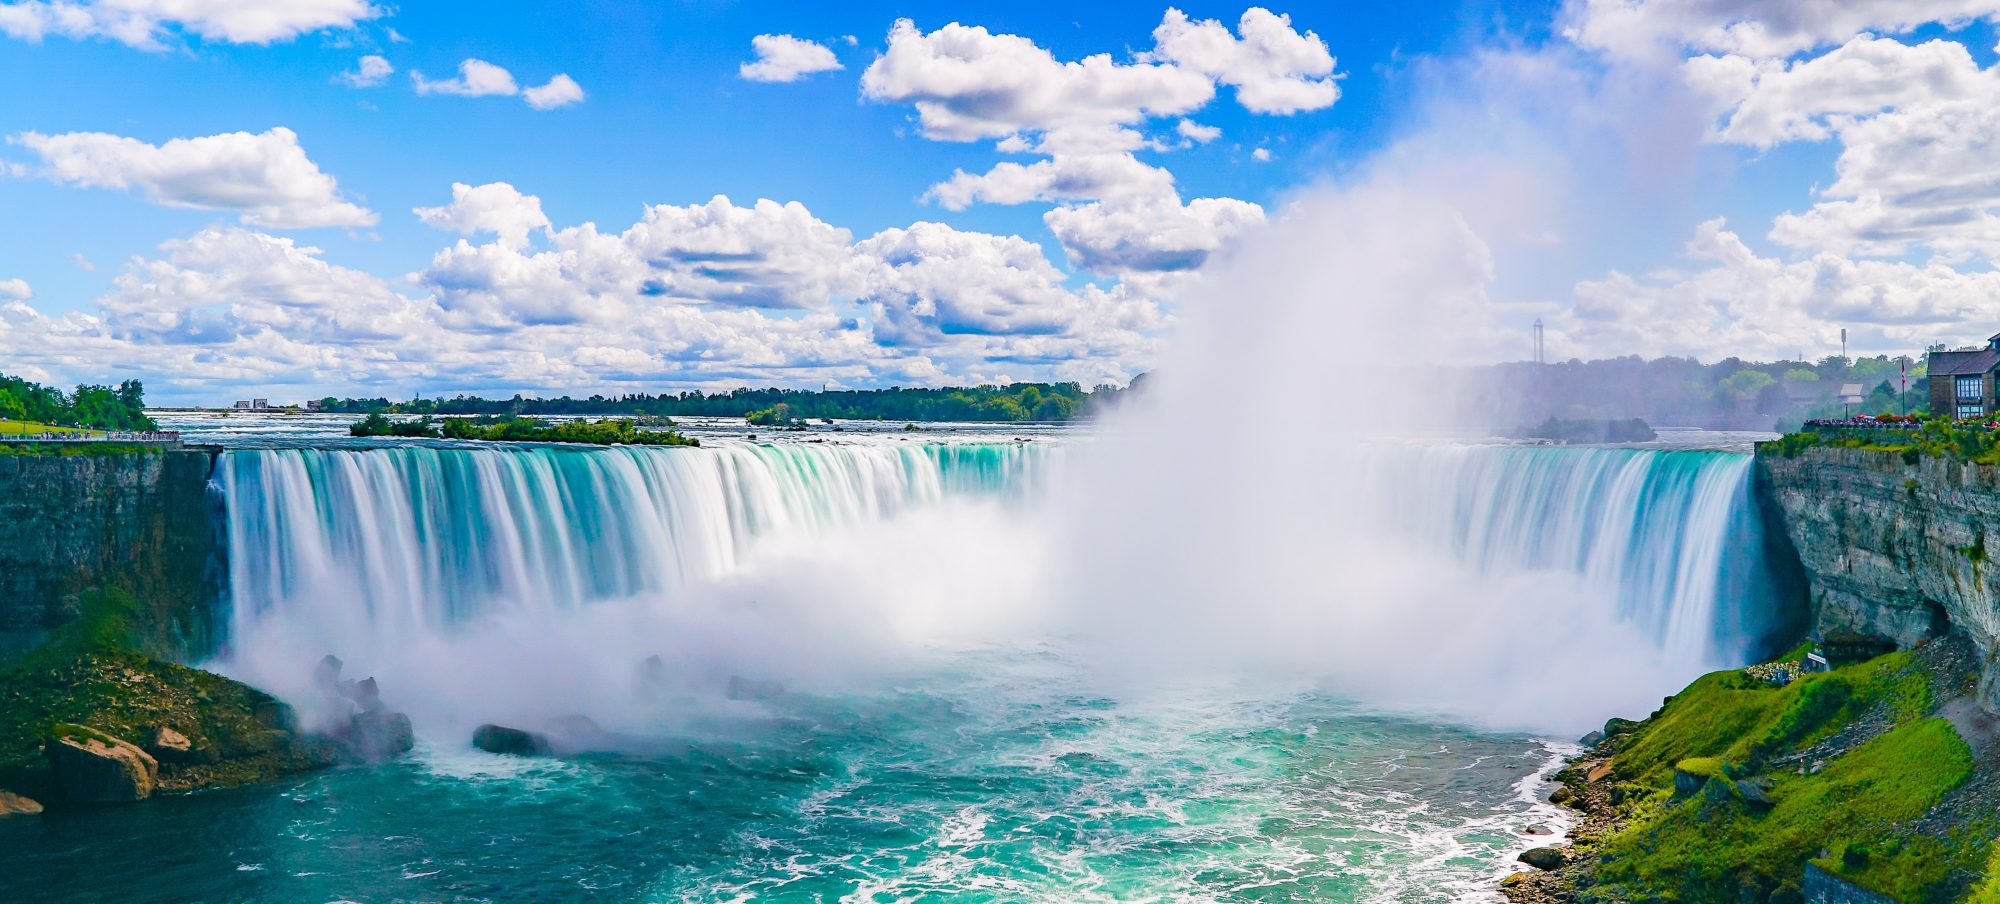 Niagara Falls Gorge Waterfront